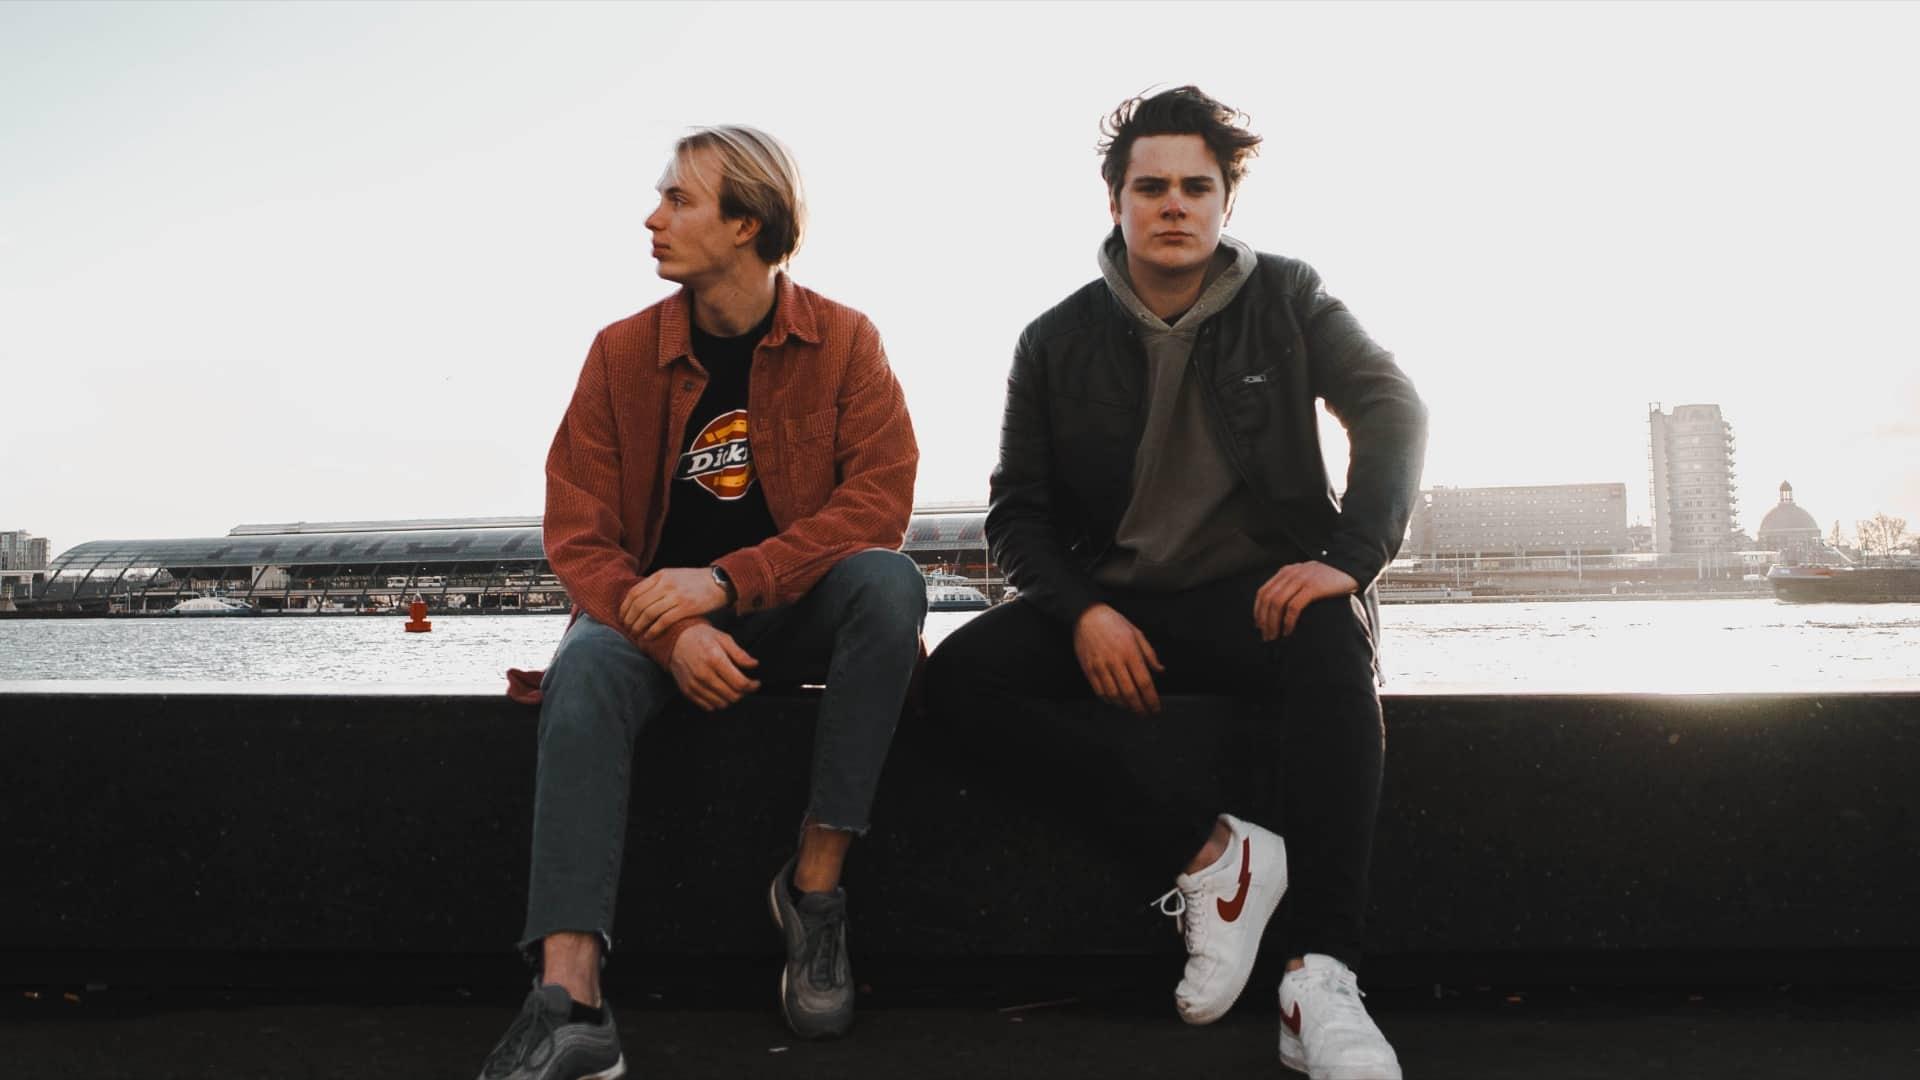 Thomas Nan & Max Vermeulen